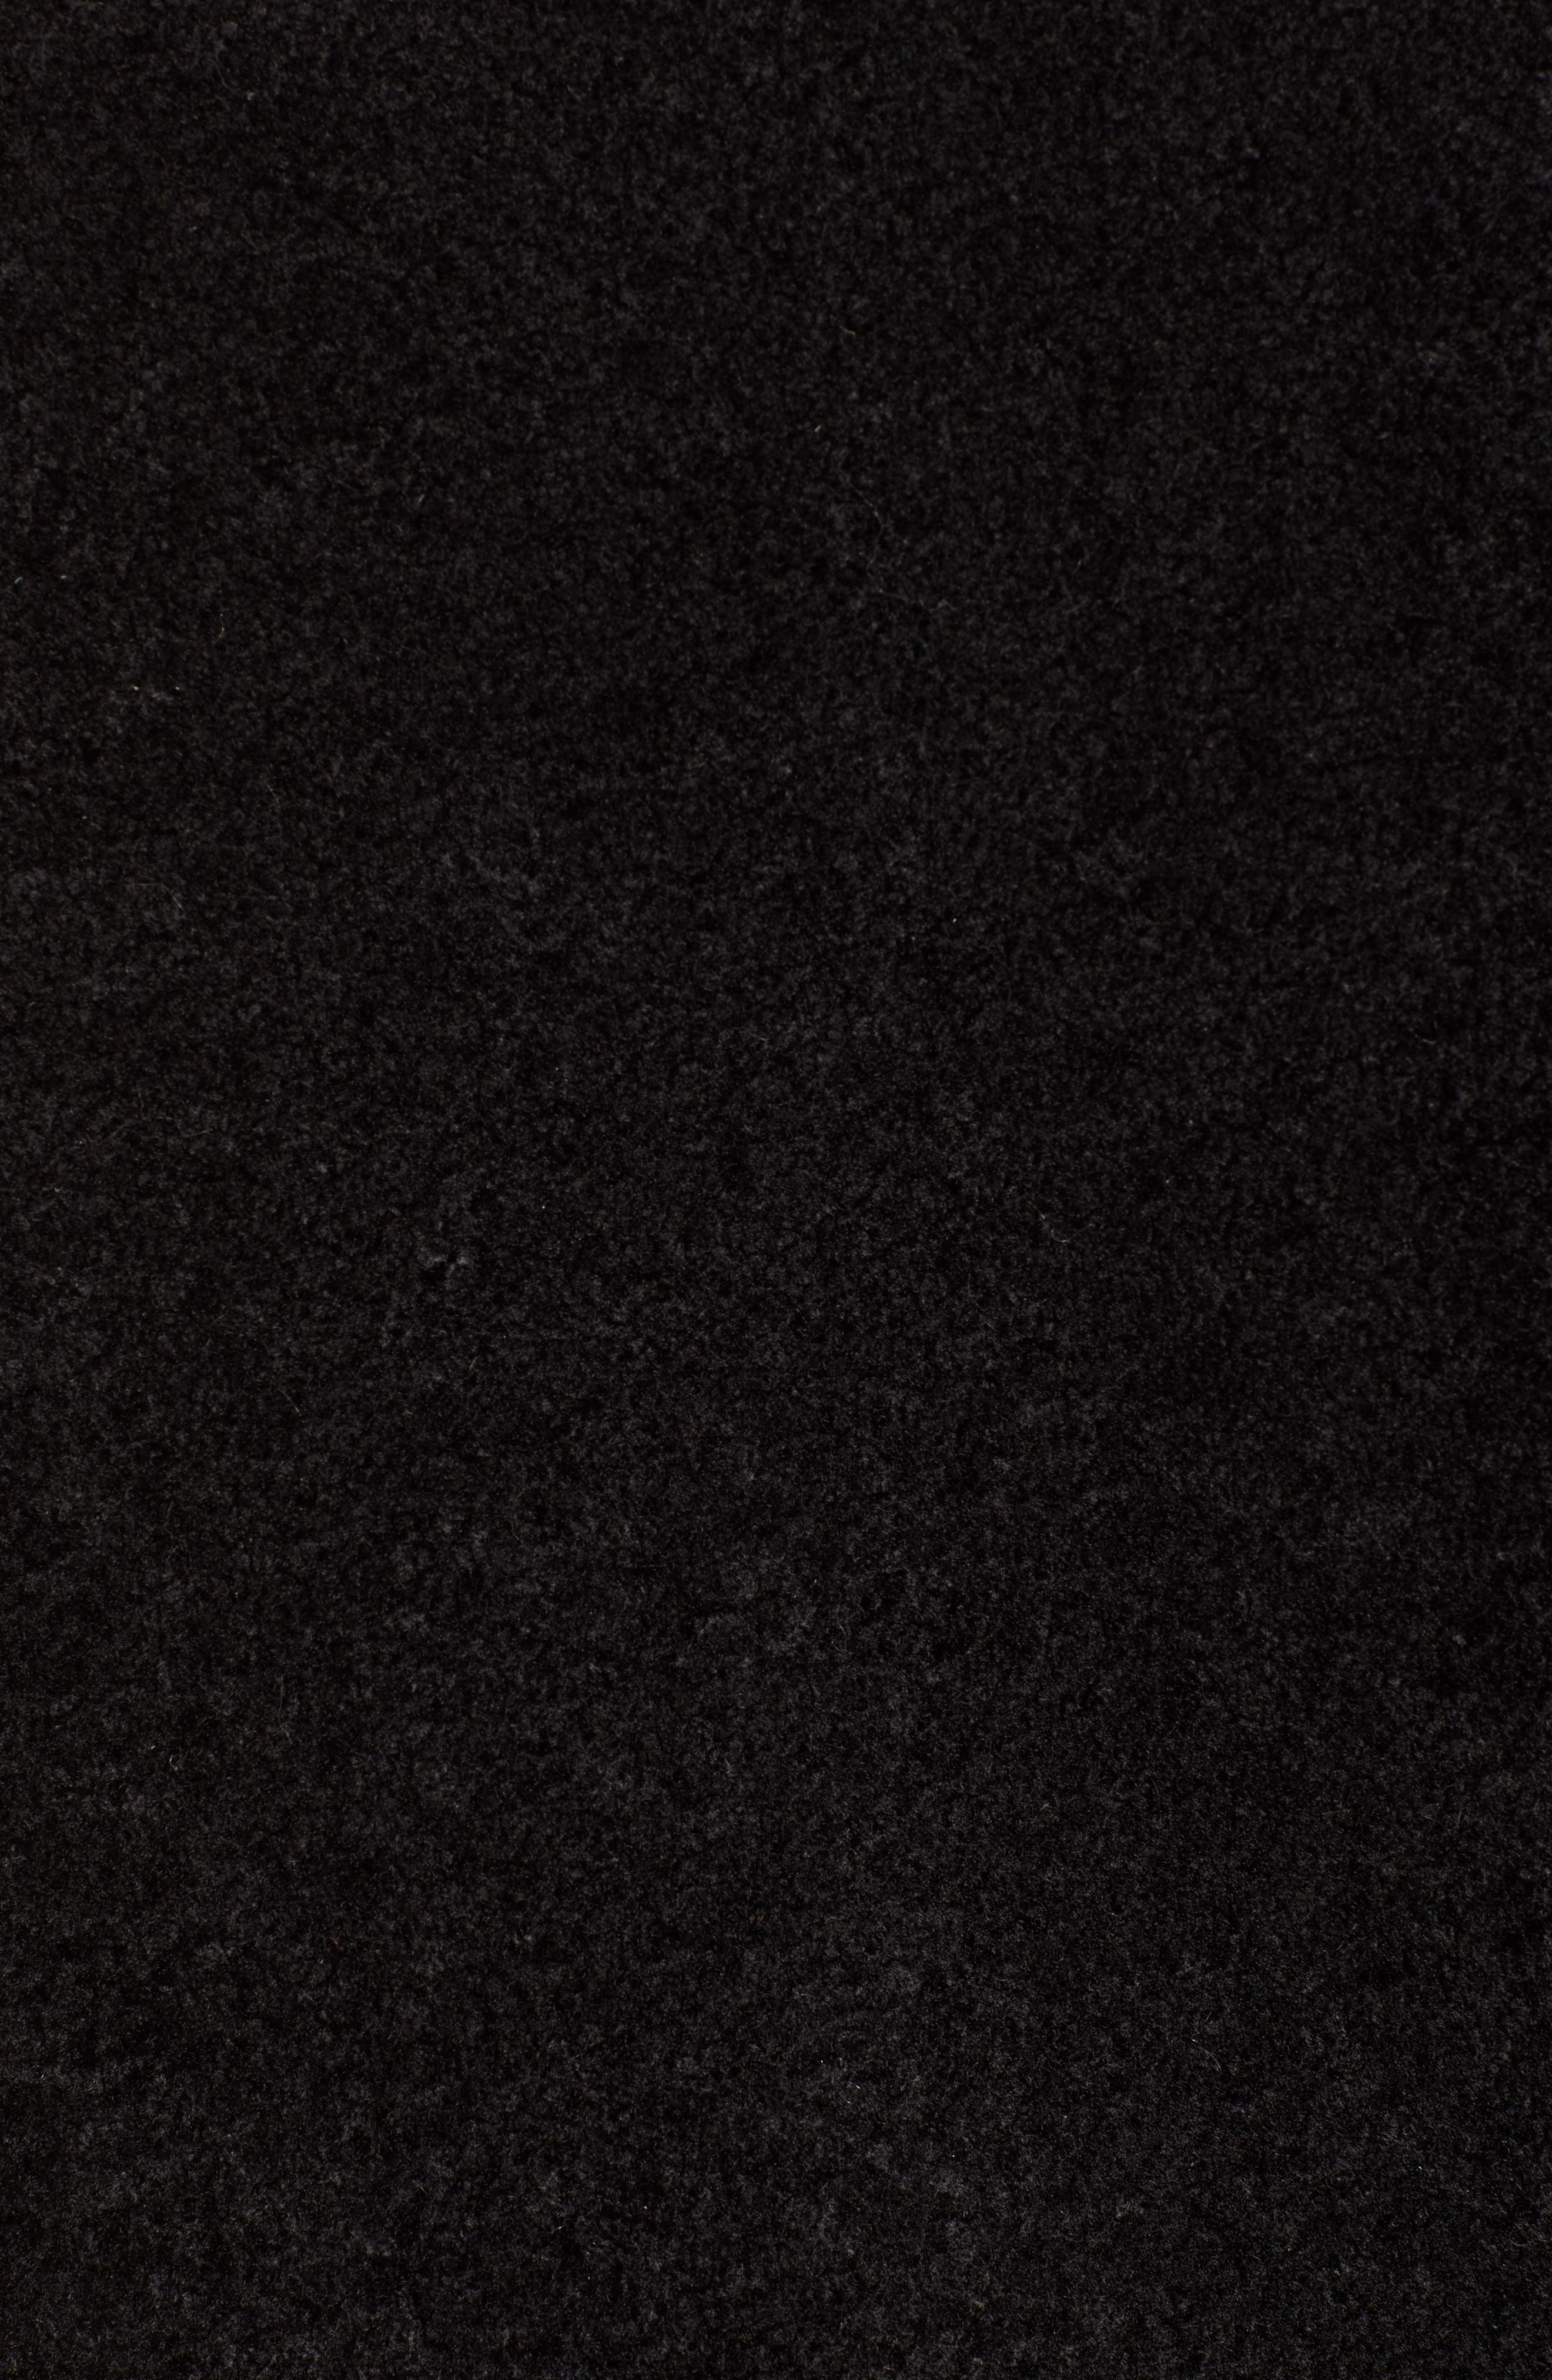 Gray Faux Fur Track Jacket,                             Alternate thumbnail 7, color,                             BLACK CAT